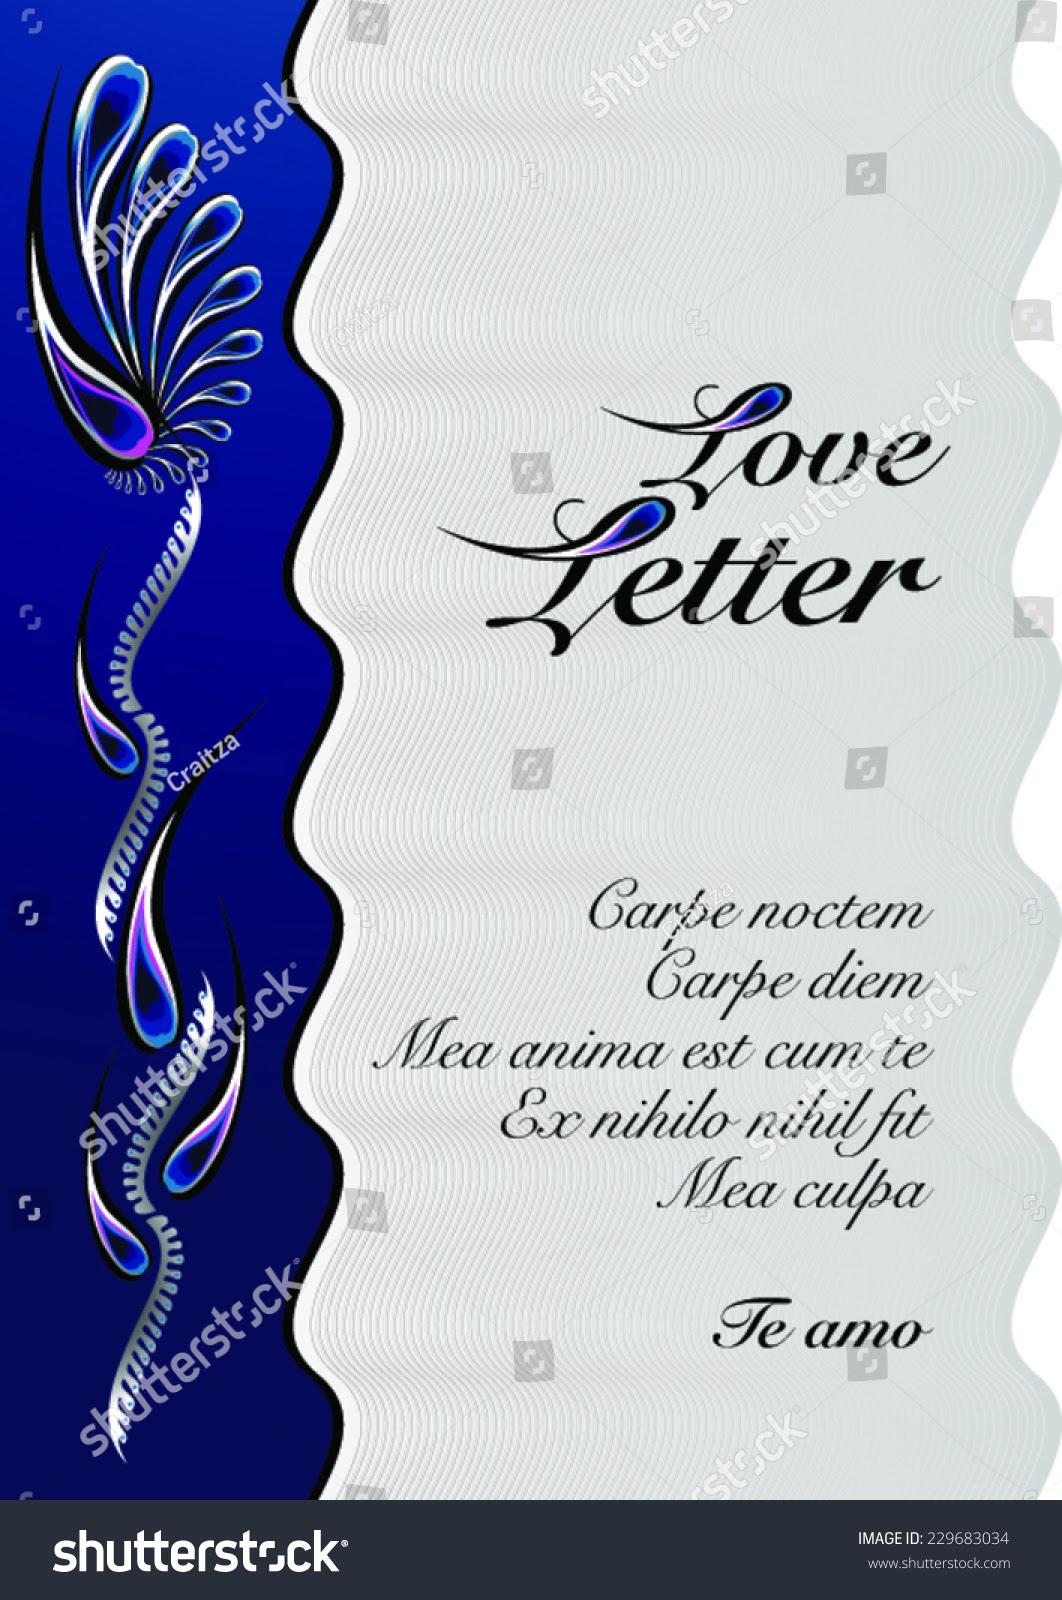 Love Letter Decorated Letterhead Template Editable Stock Vector ...